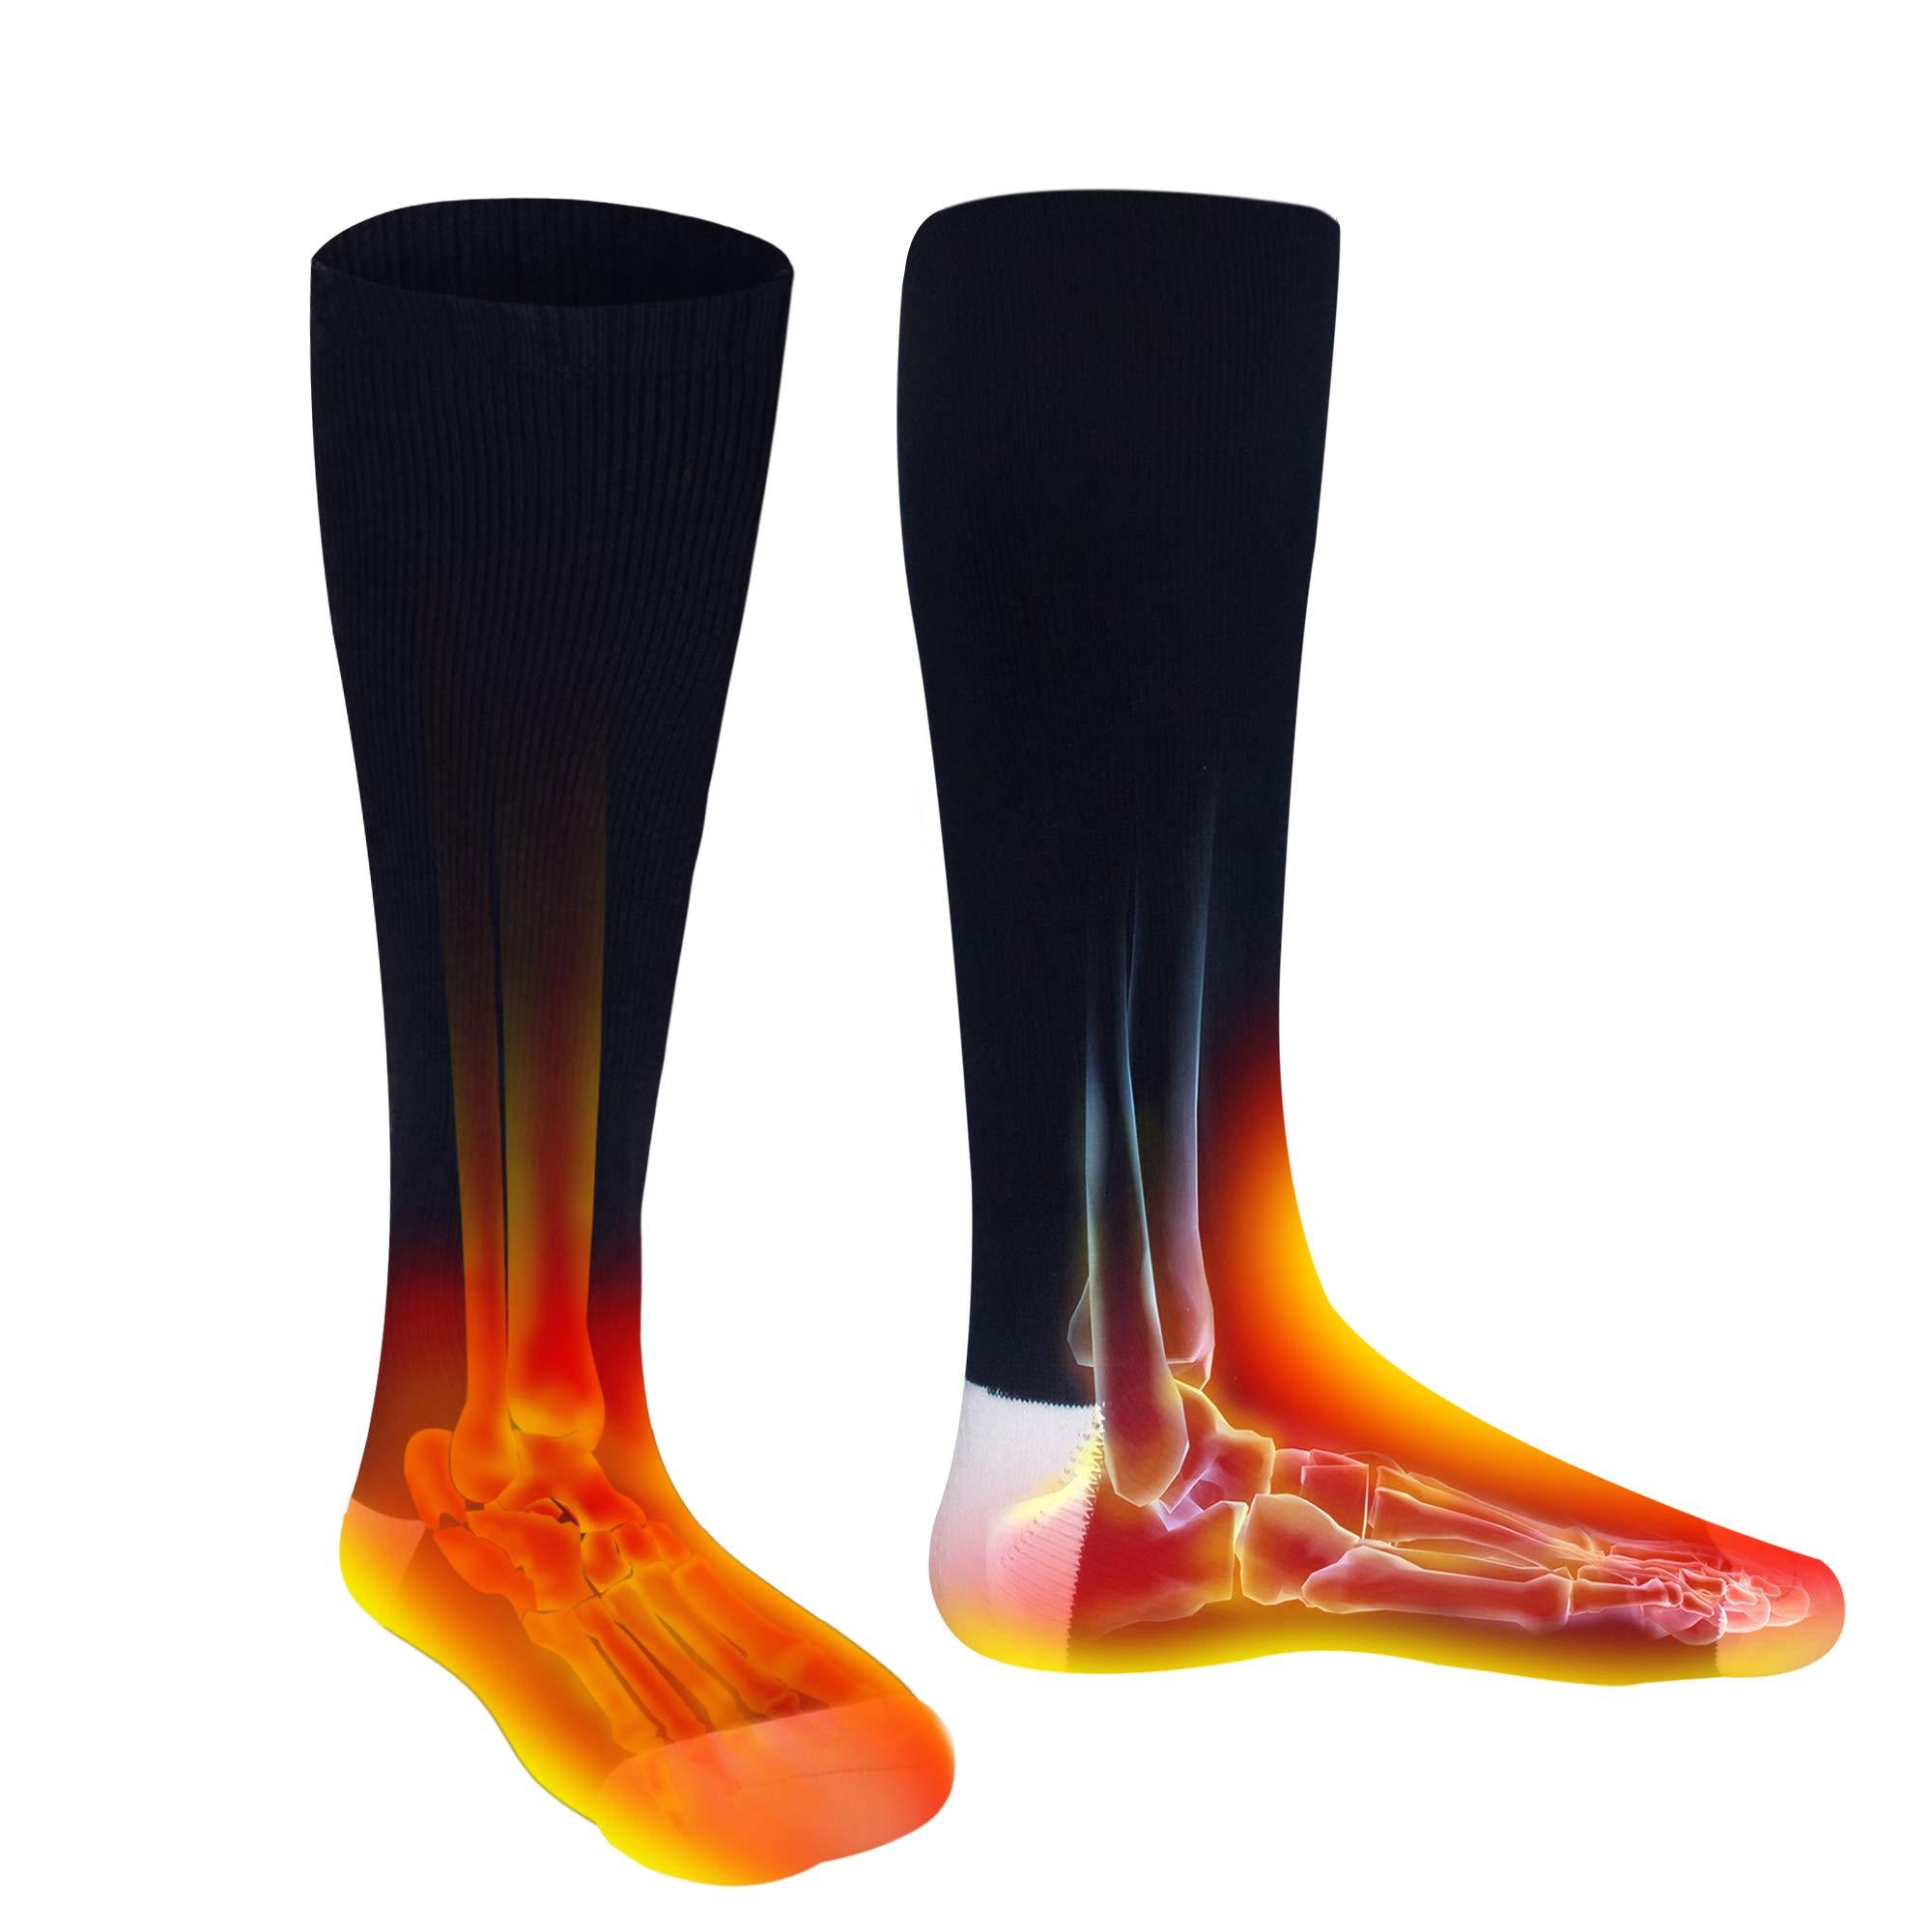 Men Women Socks Electric Socks Heated Socks for Chronically Cold Feet, Rechargeable Batteries Socks Hiking Socks Skiing Socks Socks (Dark Blue) by Highting